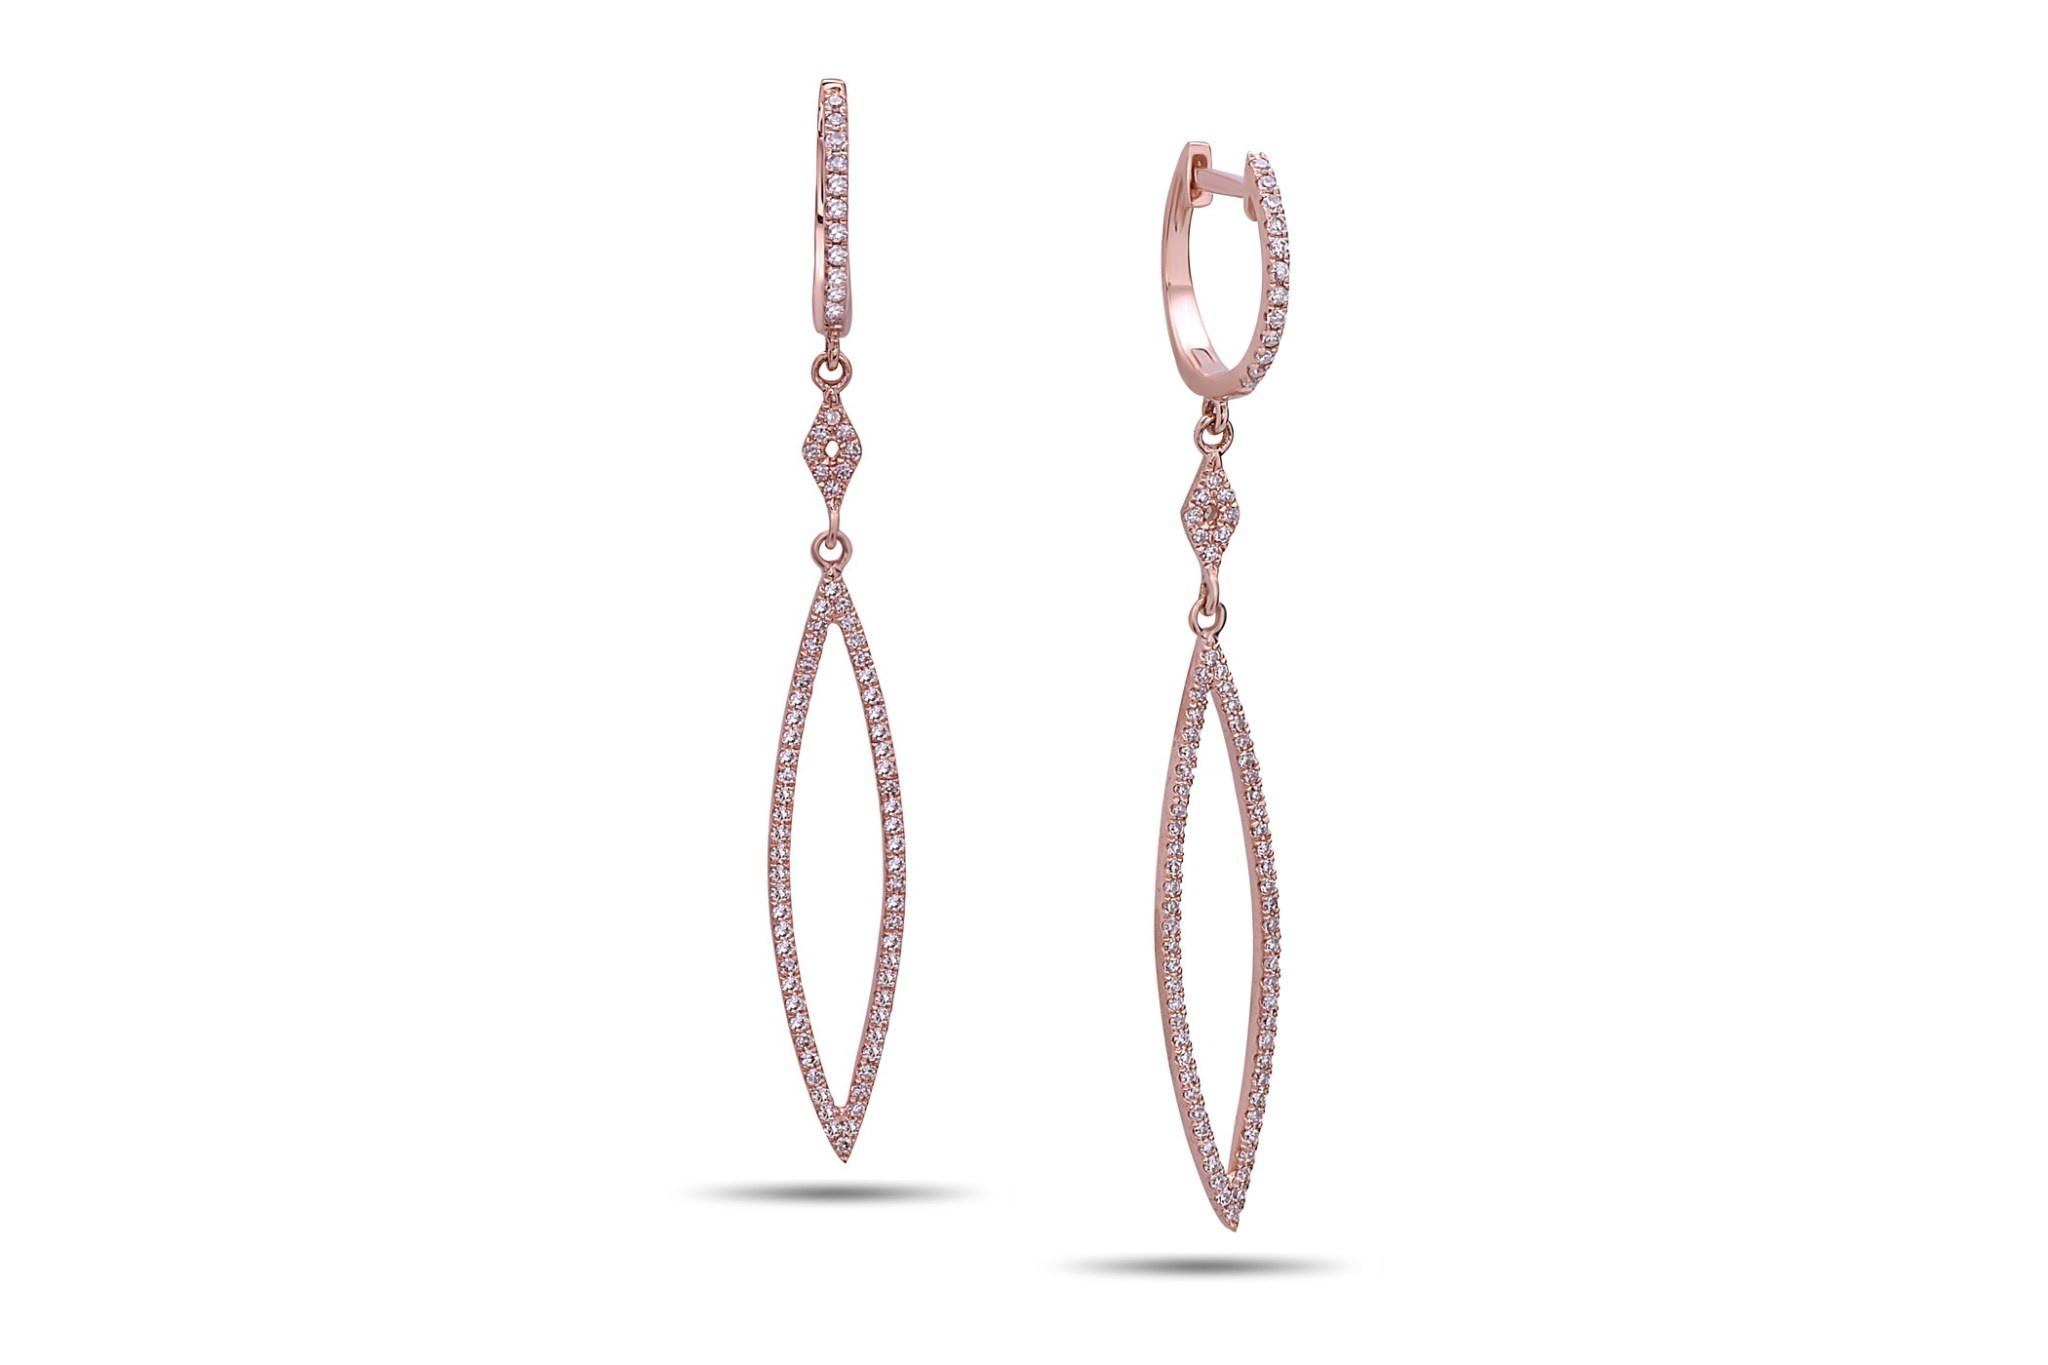 e9be3a214258fb AE81235D-800R. 14k rose gold diamond marquise shape dangle earring ...